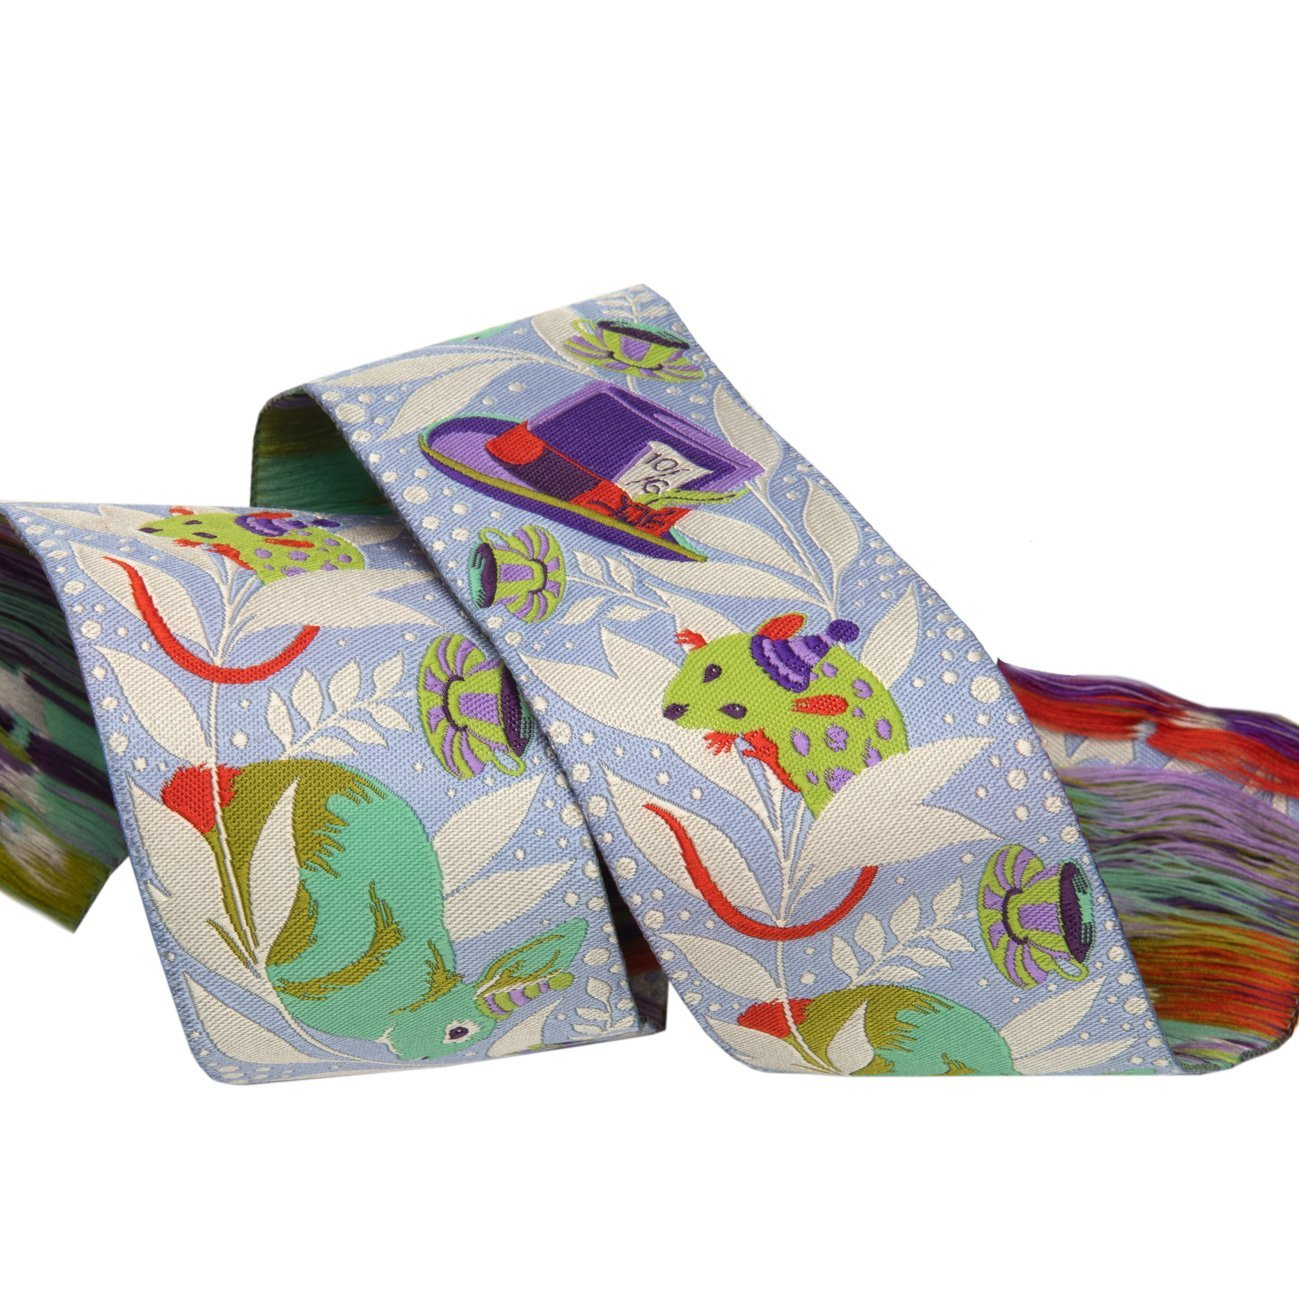 Renaissance Ribbons -Tula Pink Curiouser - Madhatter Purple-2